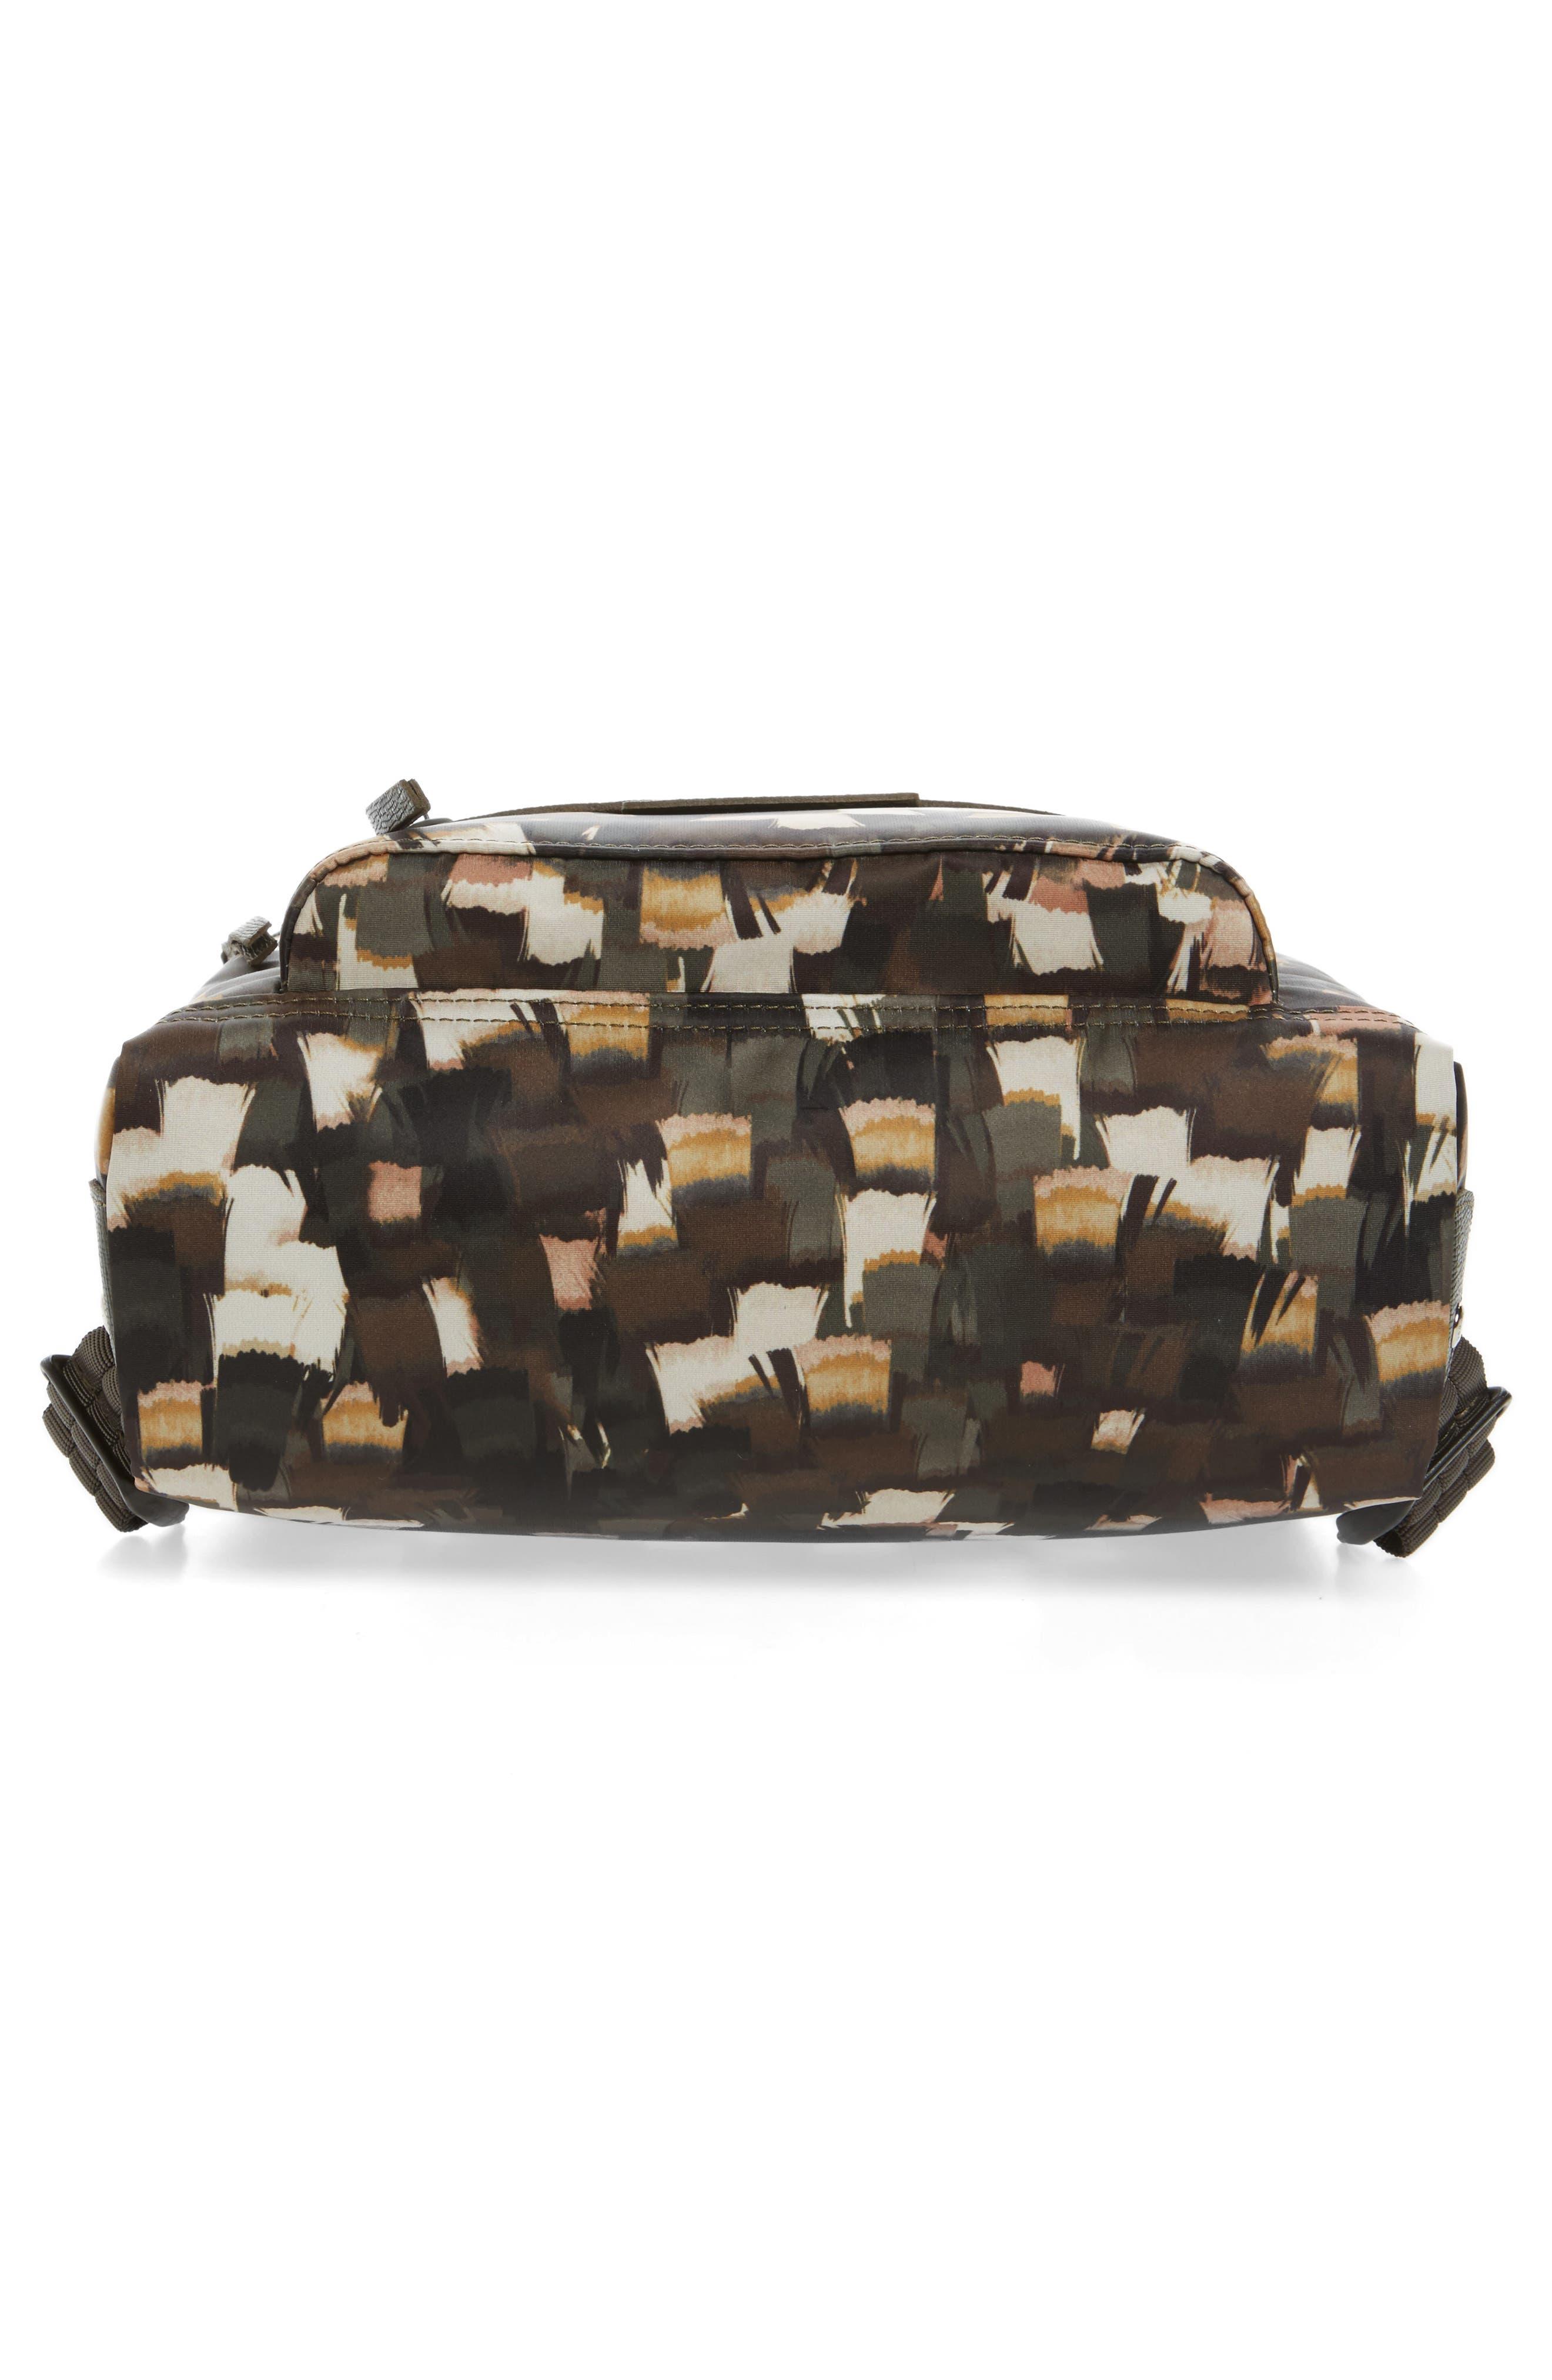 Le Pliage Neo - Vibrations Nylon Backpack,                             Alternate thumbnail 6, color,                             300